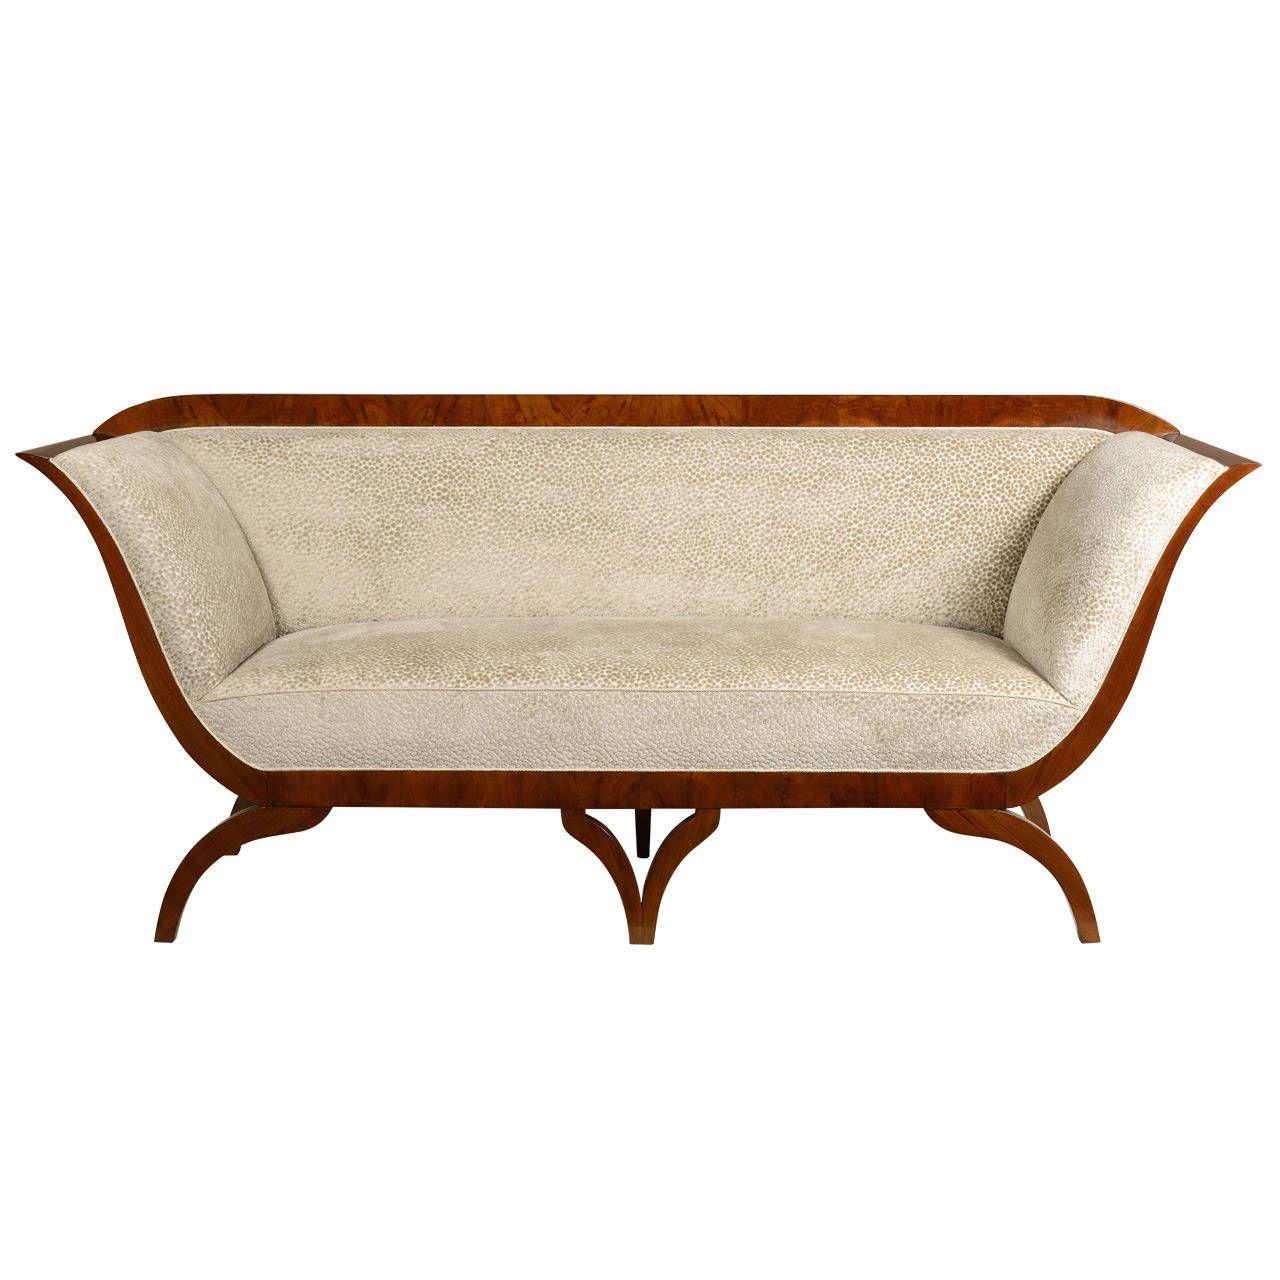 Pin By Clair Watson On Hero Vintage Sofa Furniture Antique Sofa